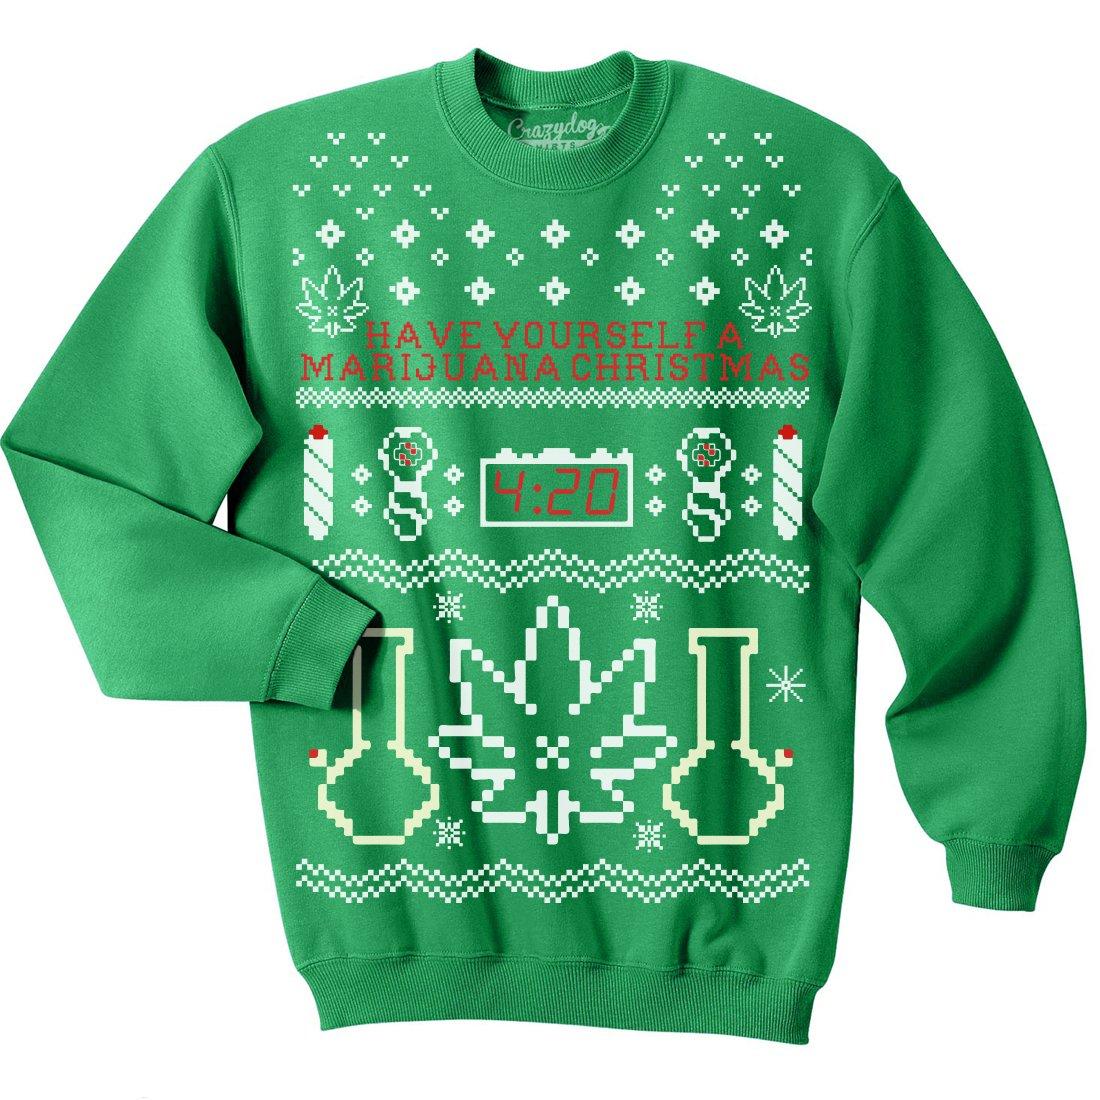 Unisex Have Yourself A Marijuana Christmas Crew Neck Sweatshirt Xmas Party Crazy Dog Tshirts